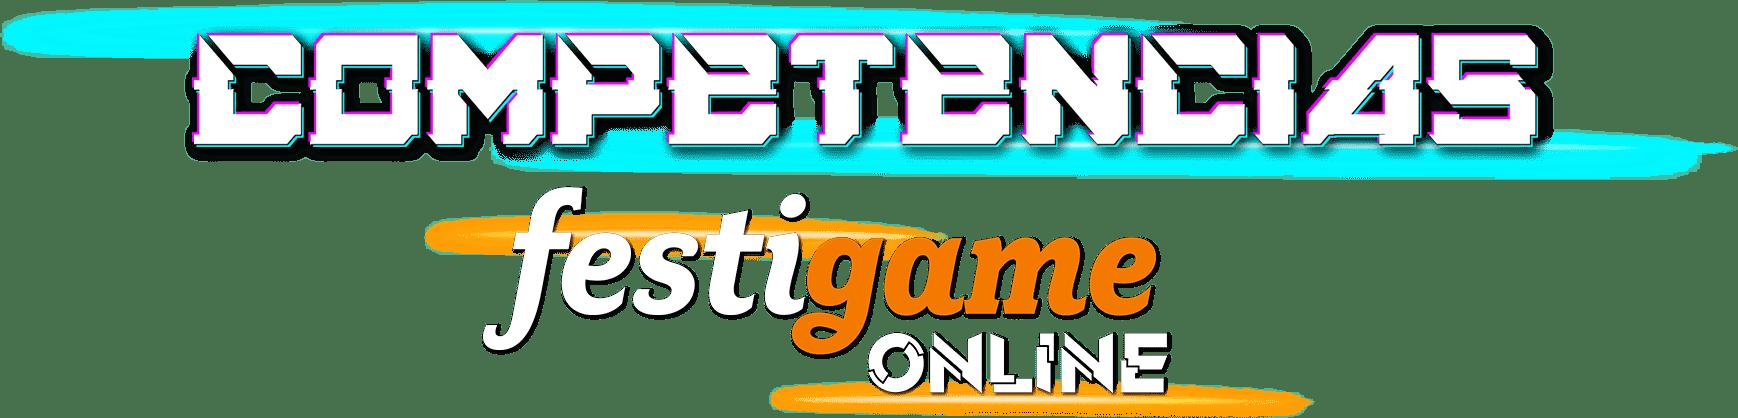 Competencias Festigame ONLINE 1